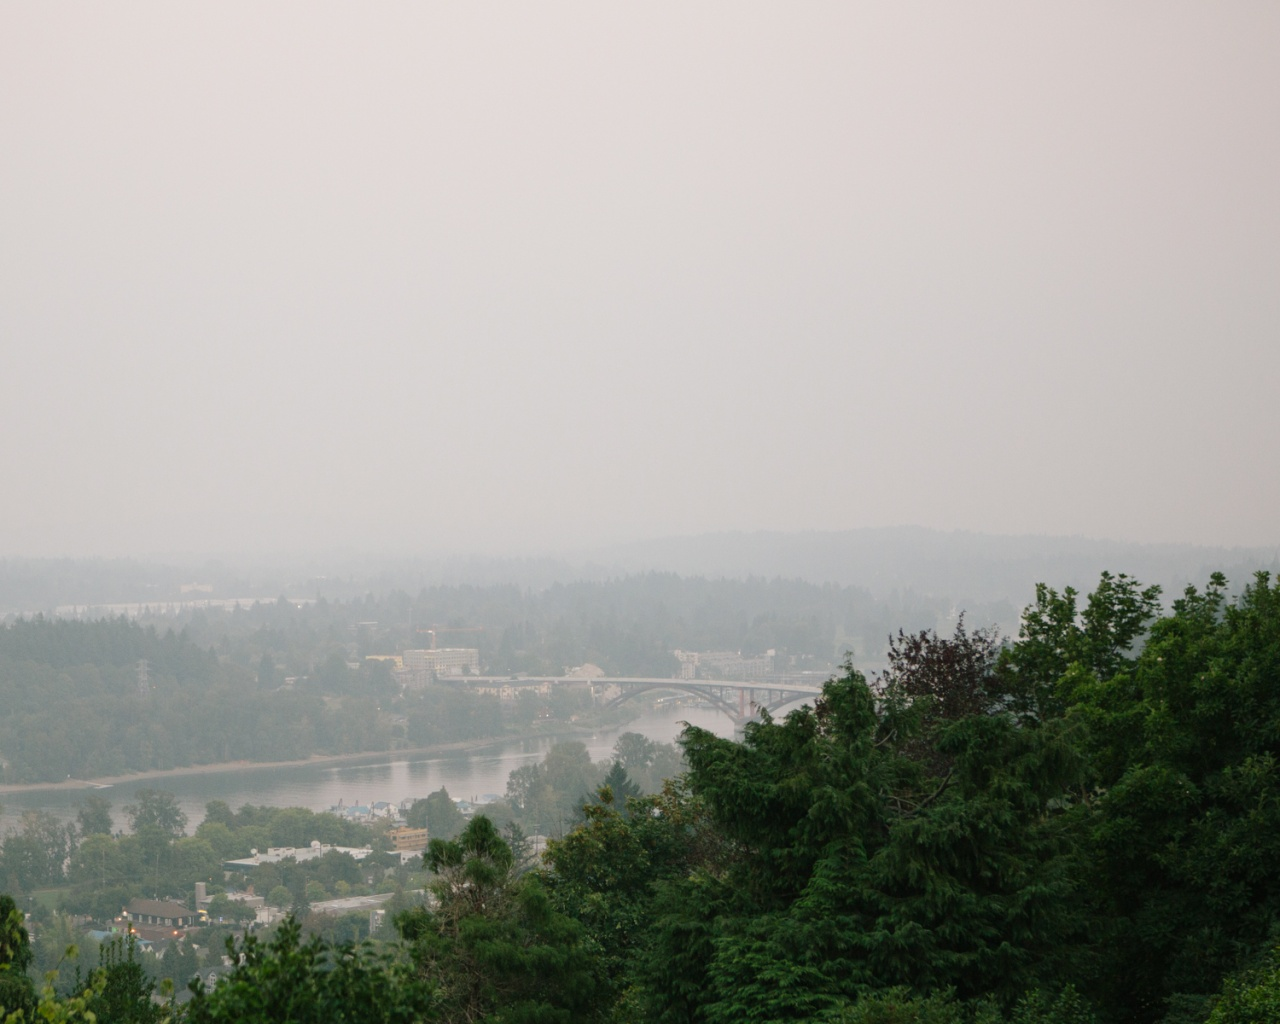 Wildfire Smoke, National Geographic